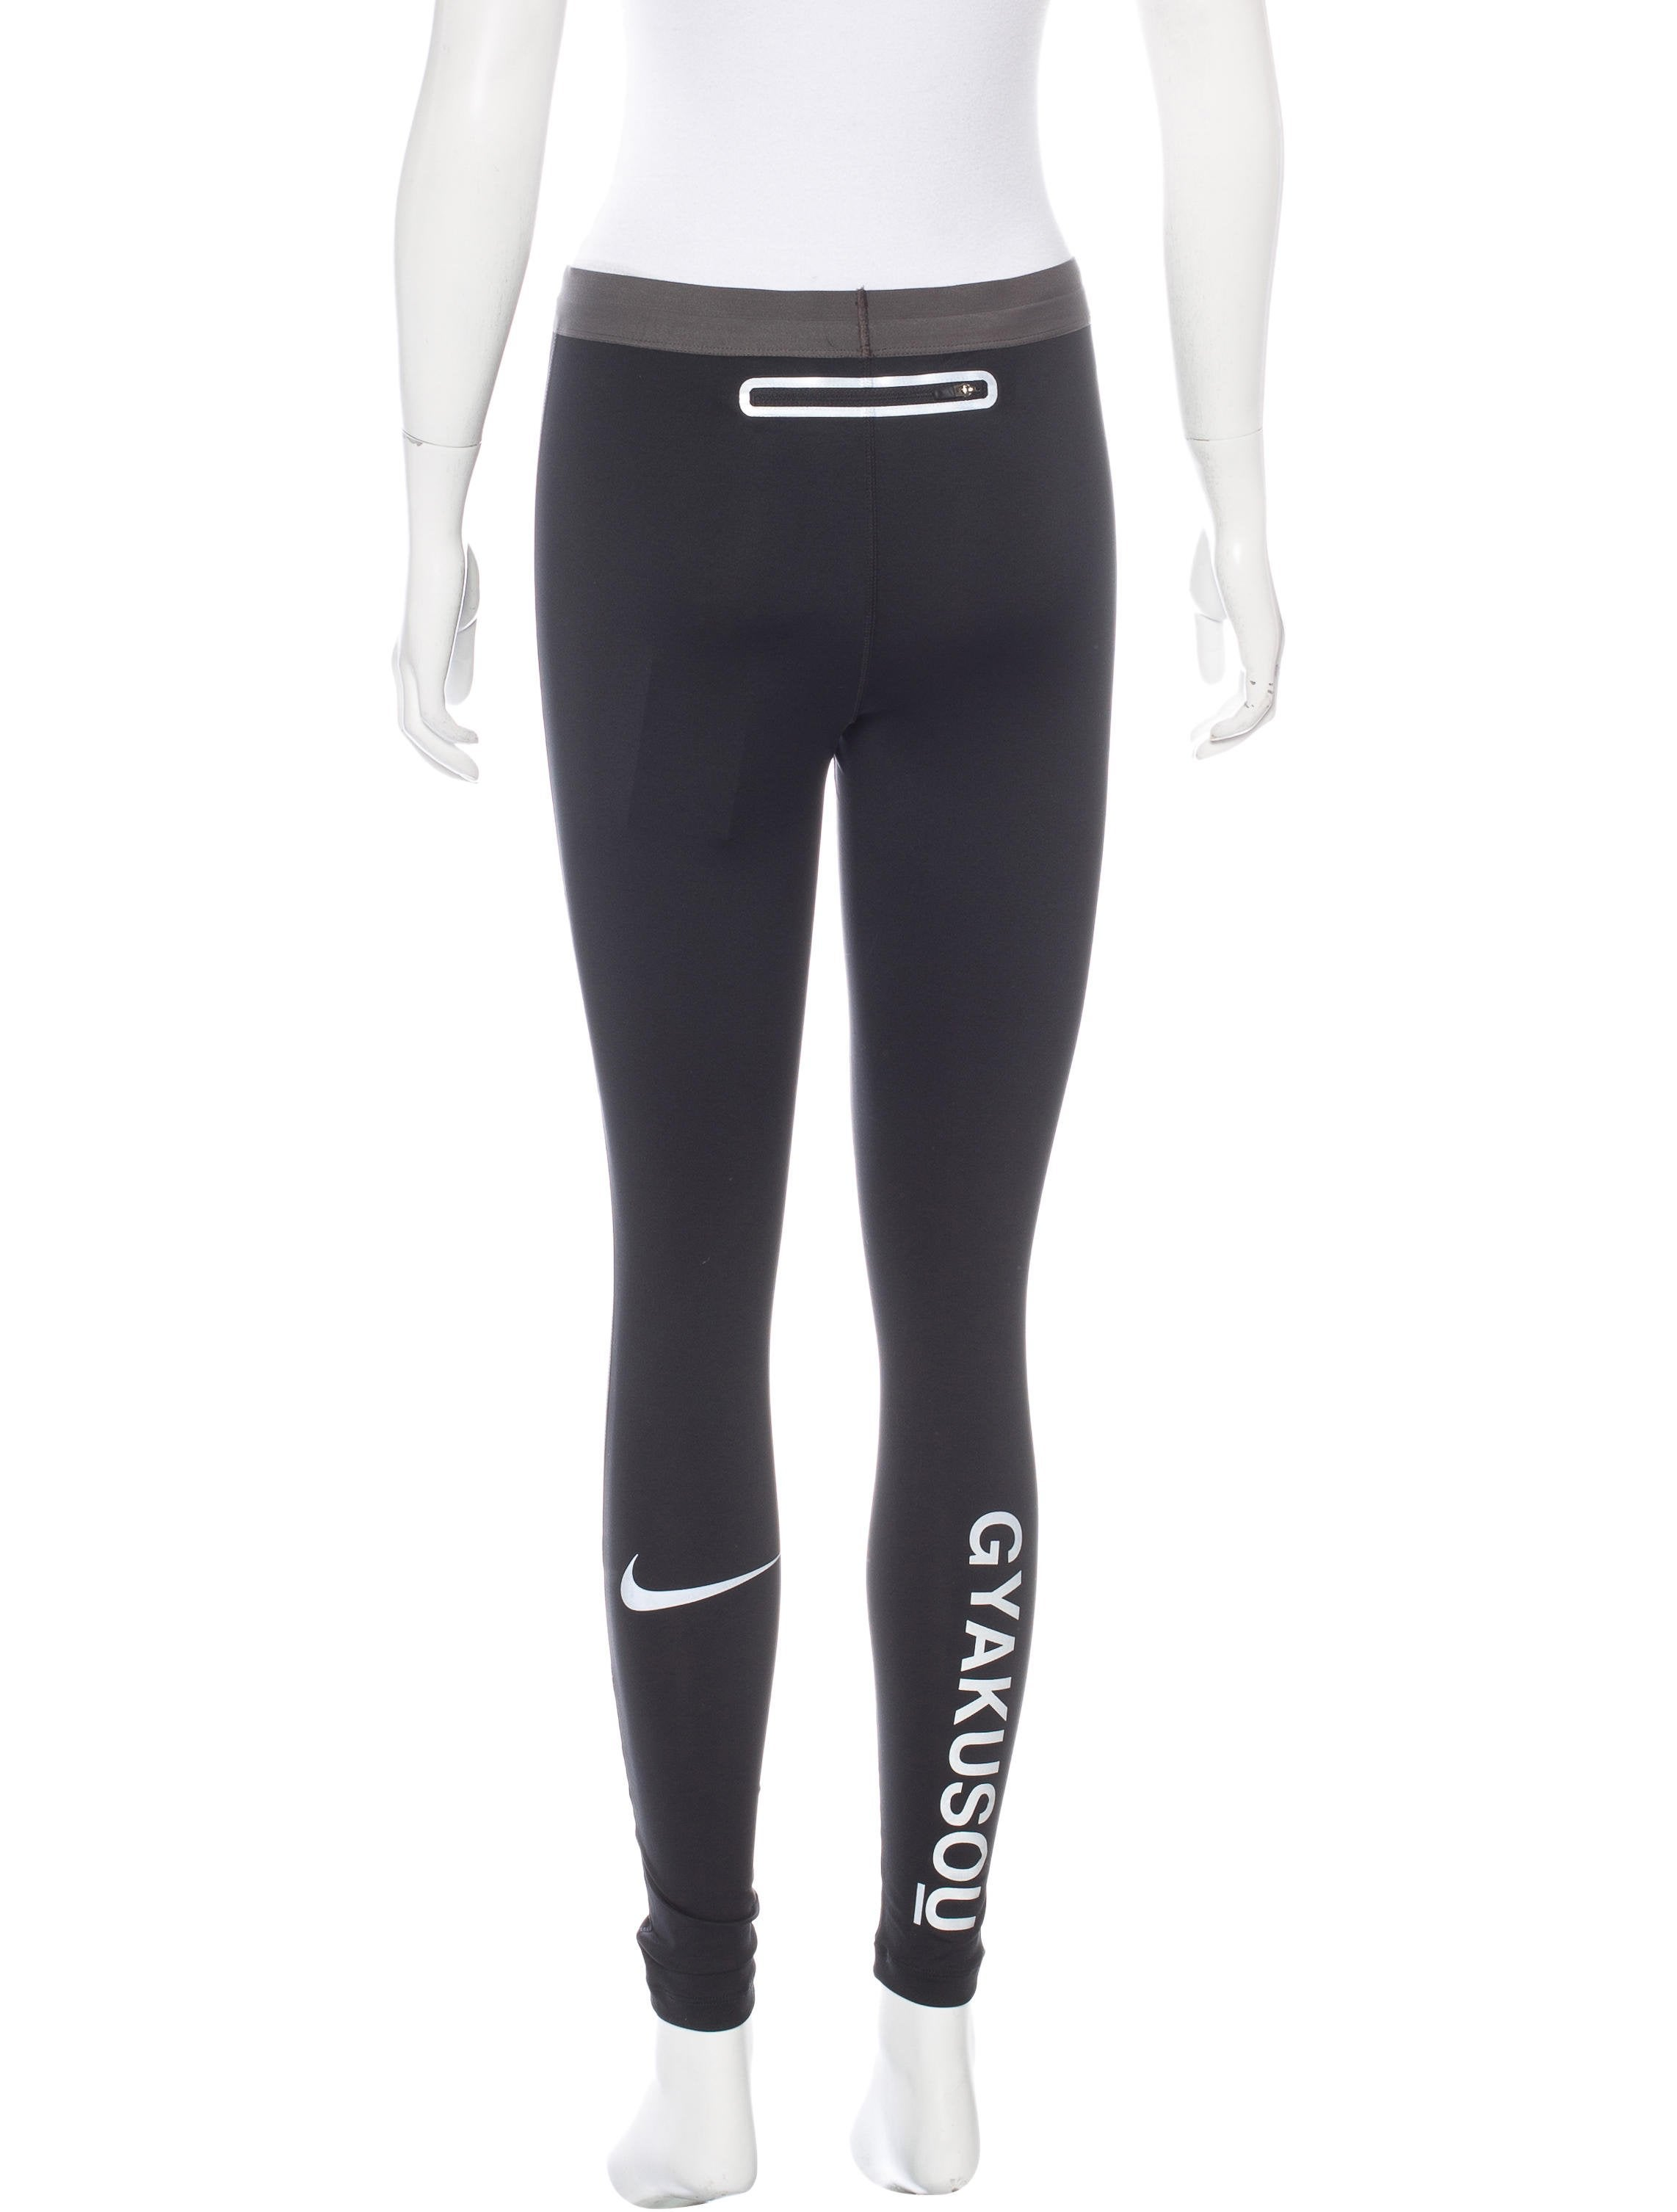 Nike Cropped Leggings - Clothing - WU221105   The RealReal